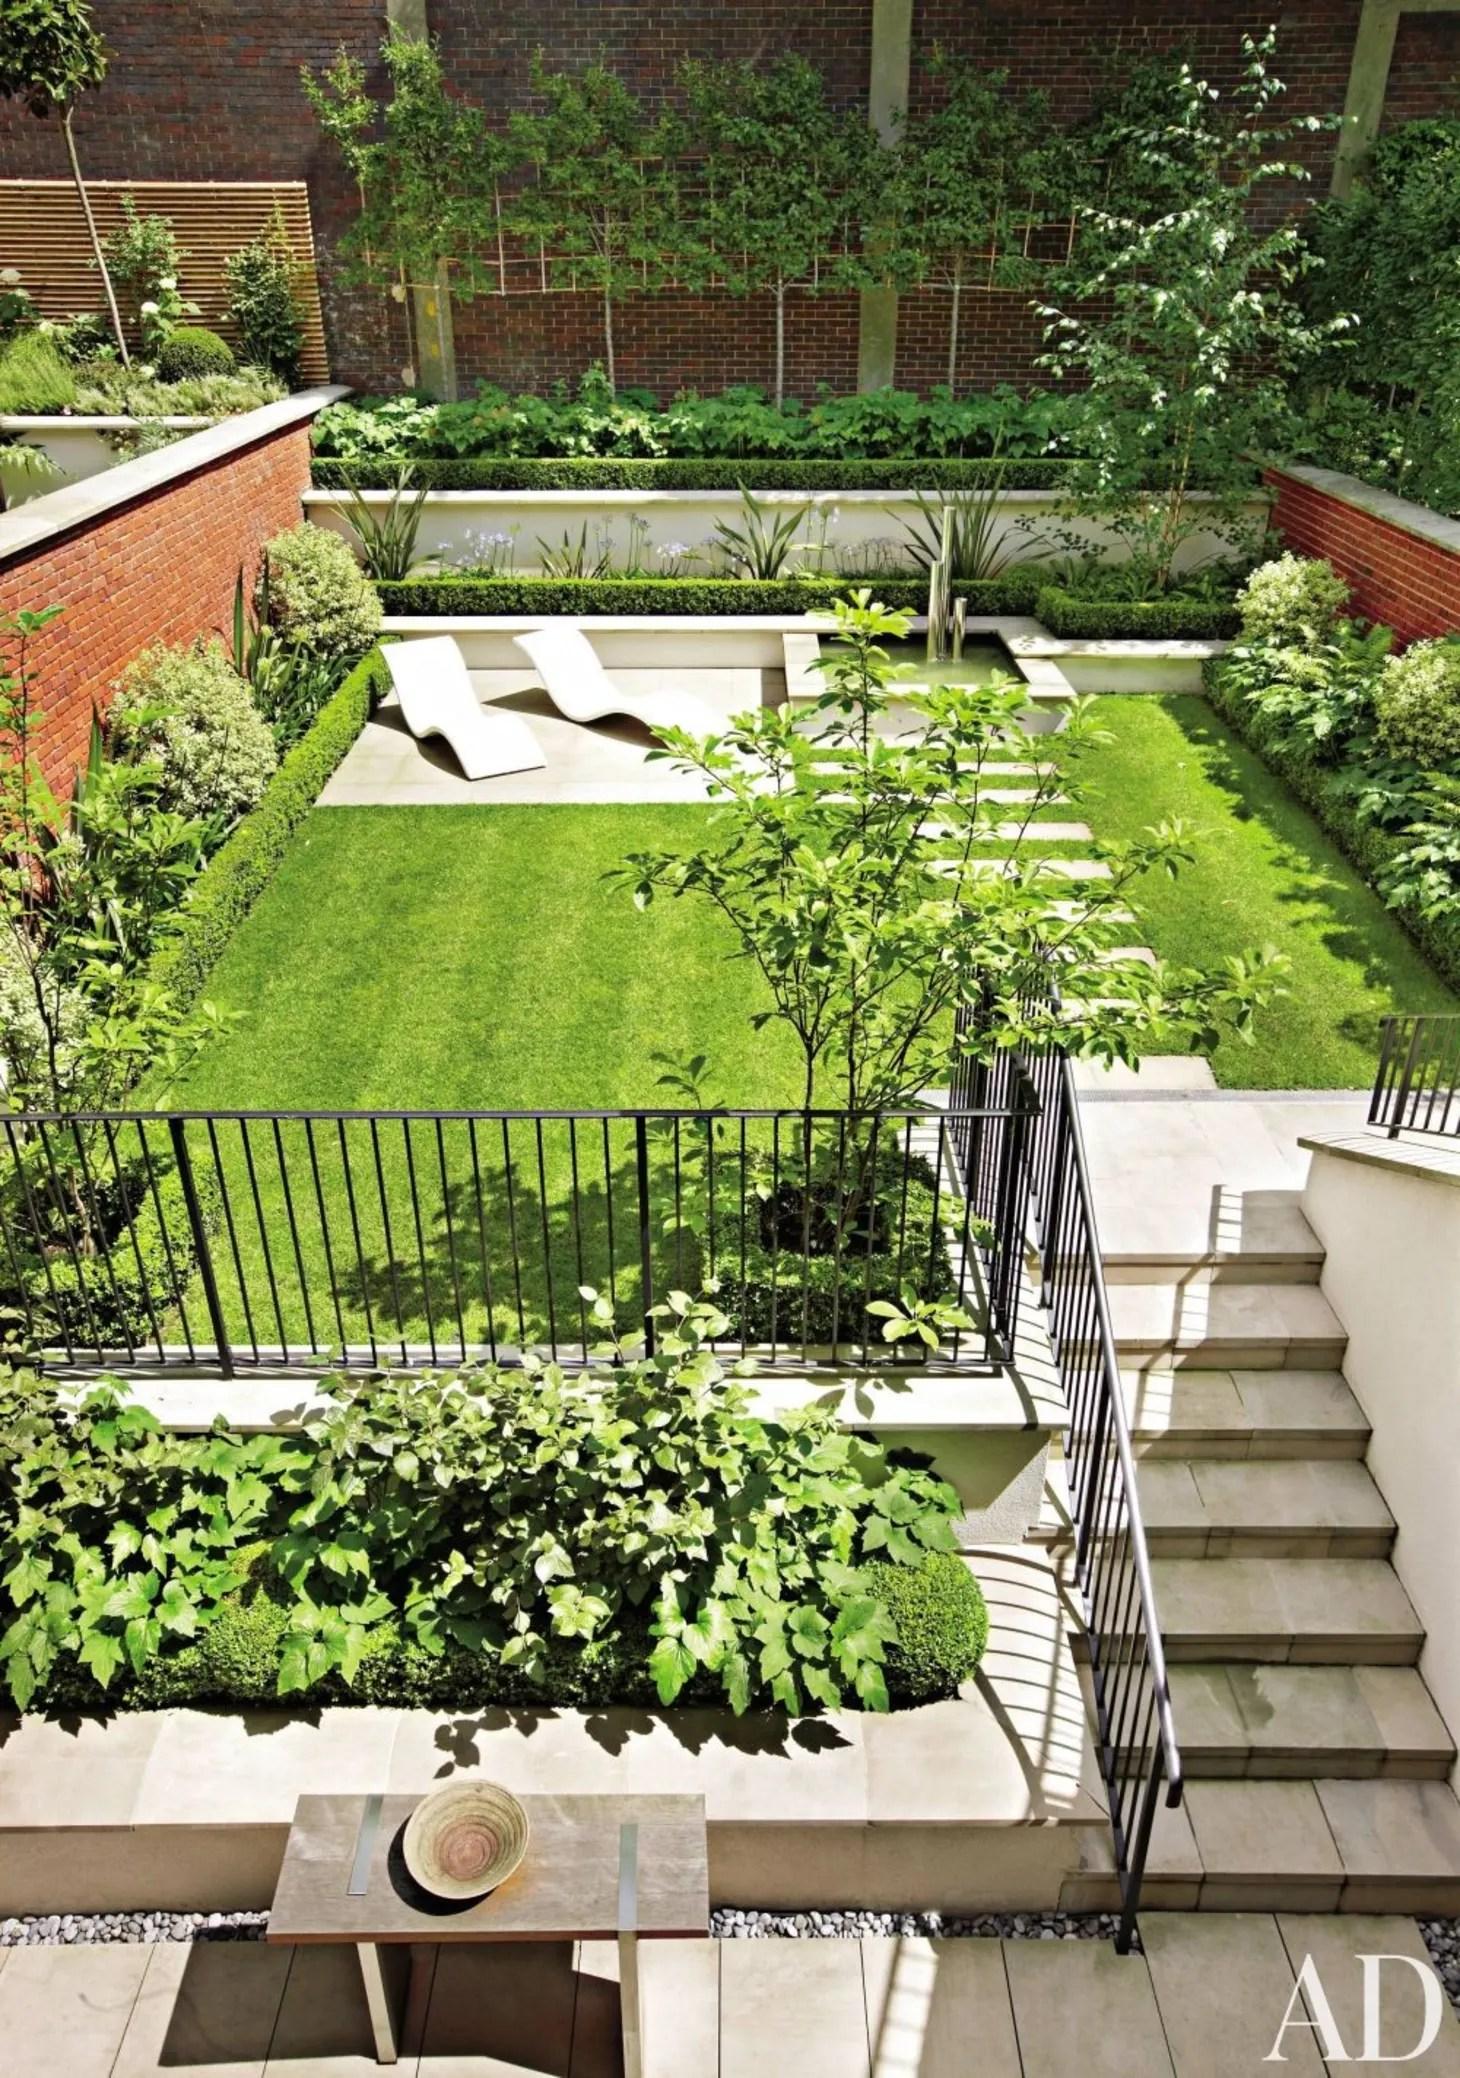 Landscape Inspiration: A Dozen Lush & Lovely Townhouse ... on Townhouse Patio Ideas id=20856